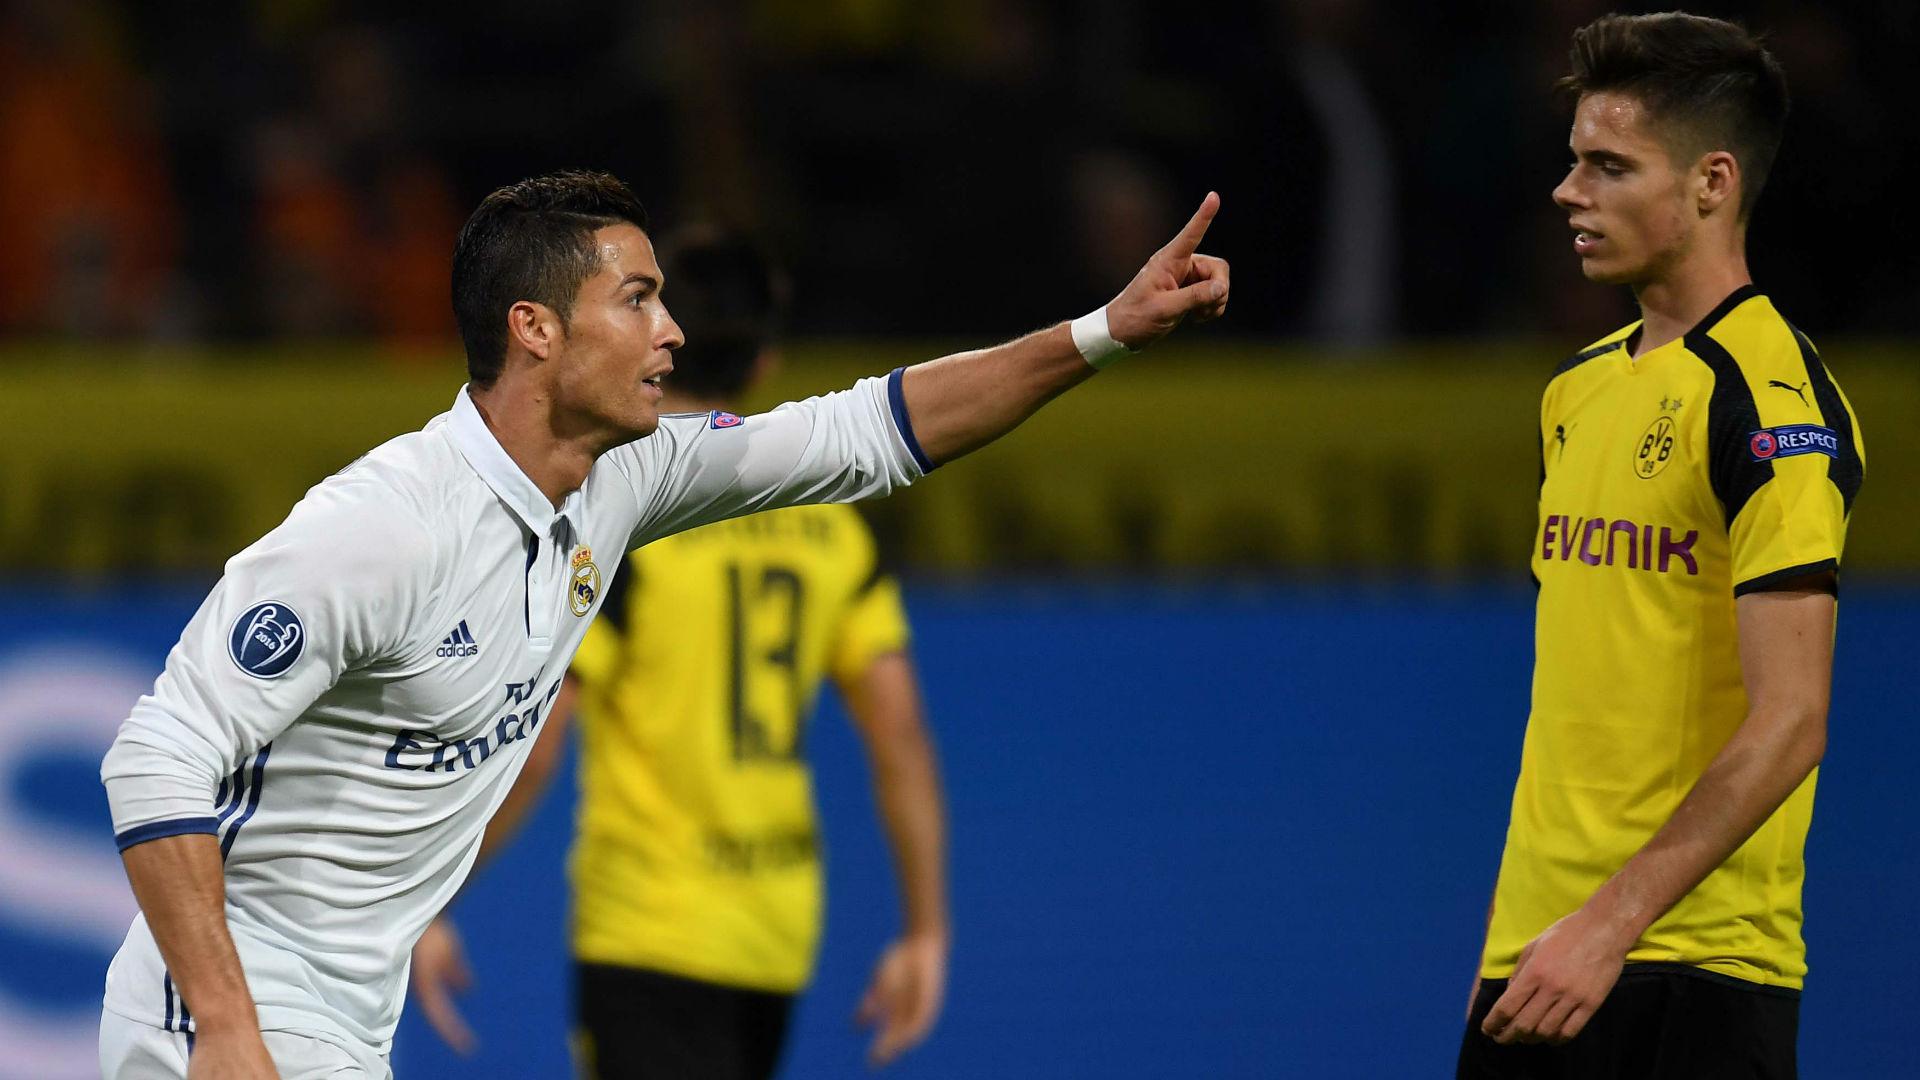 Cristiano Ronaldo Champions League Borussia Dortmund v Real Madrid 27091